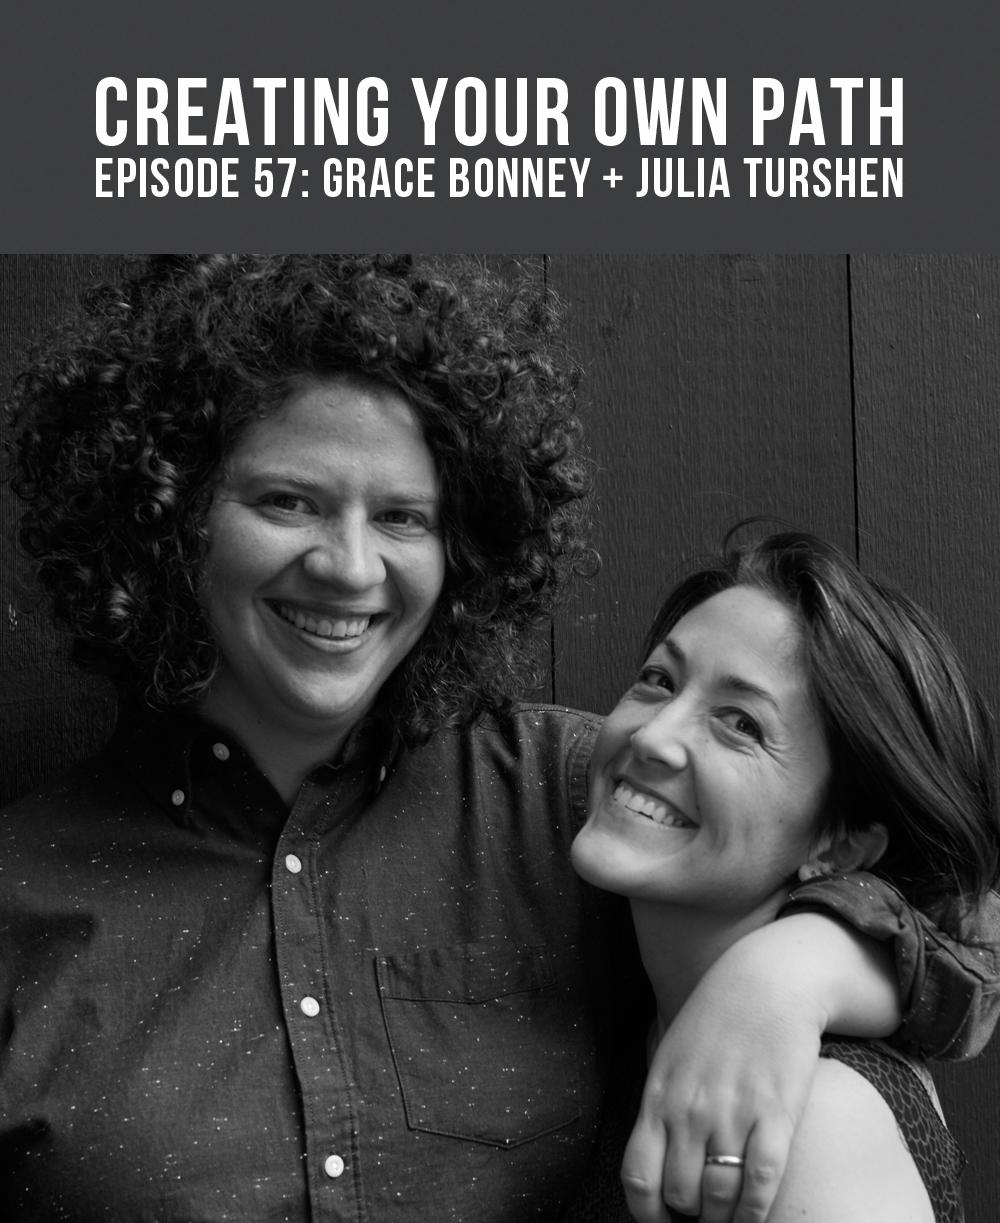 Grace Bonney  +  Julia Turshen  // Photo:  Andrea Gentl + Martin Hyers